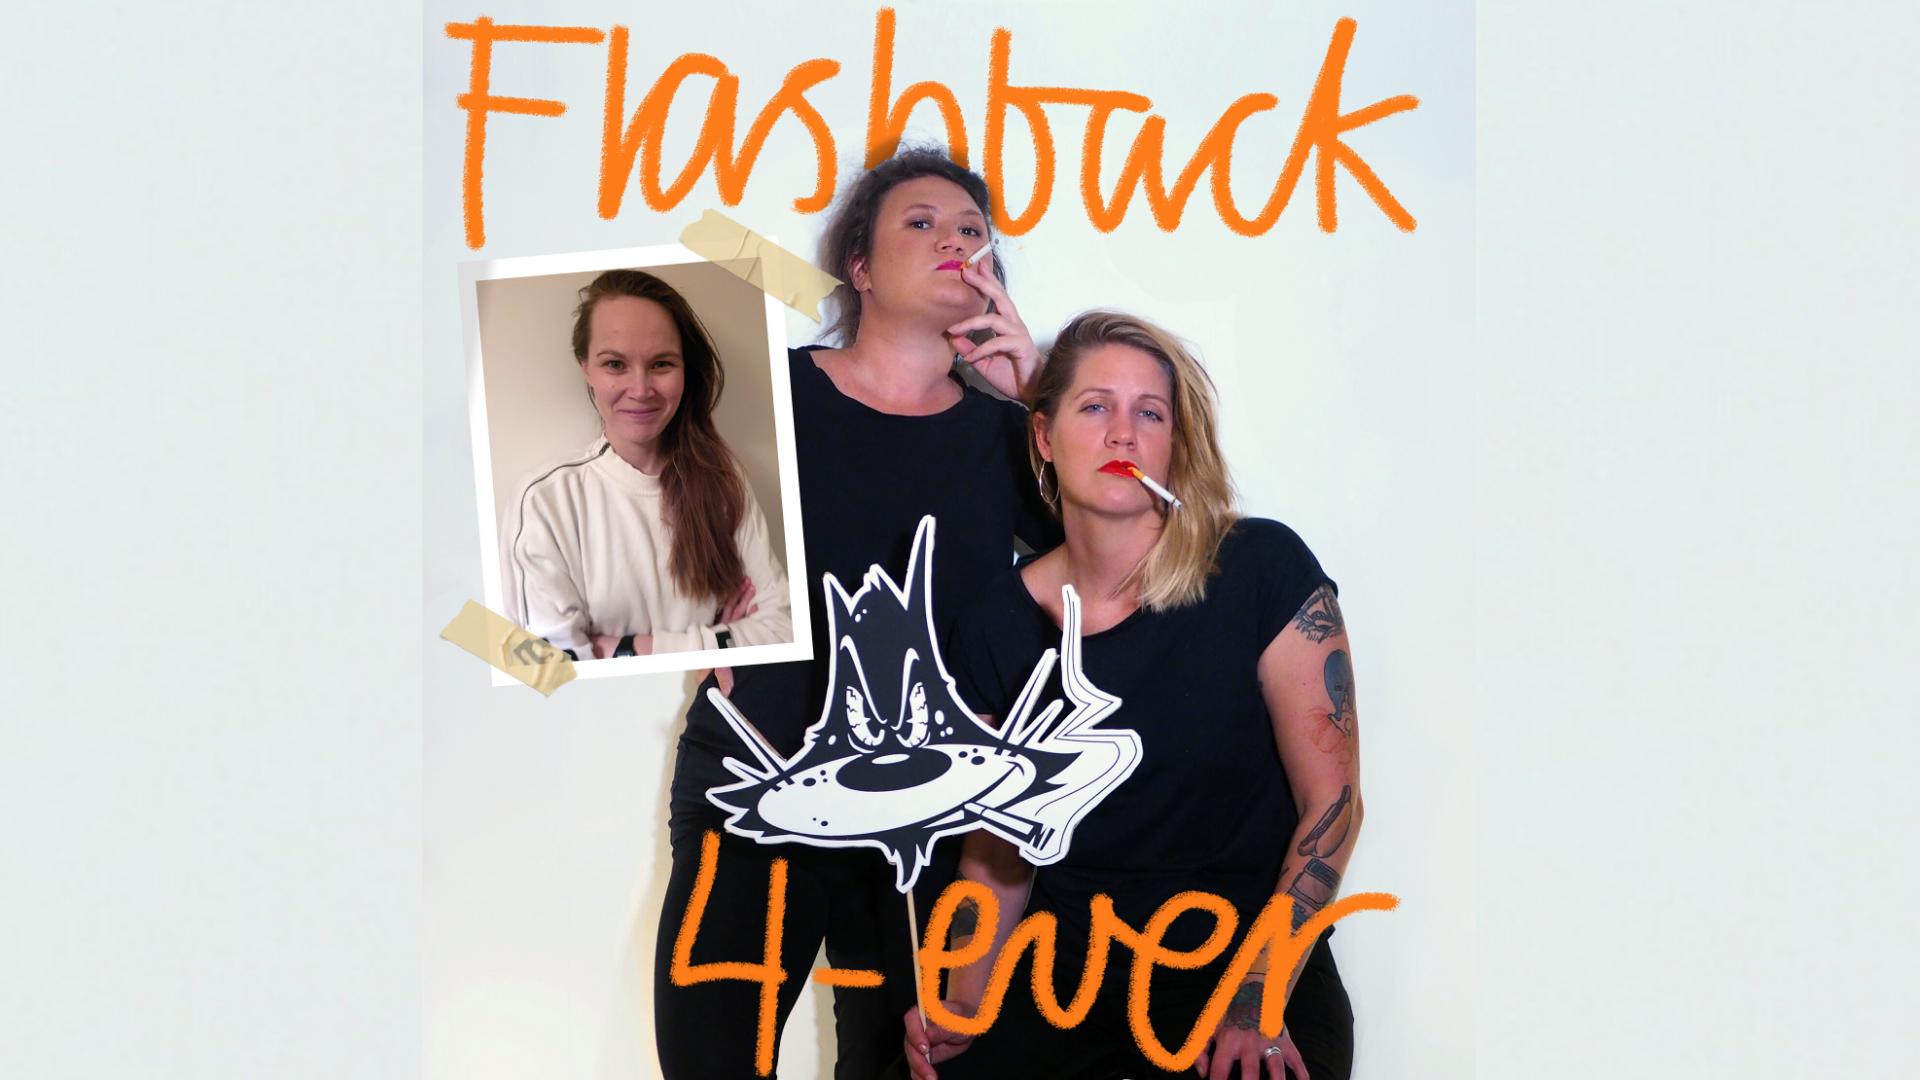 FLASHBACK FOREVER - LIVEPOD